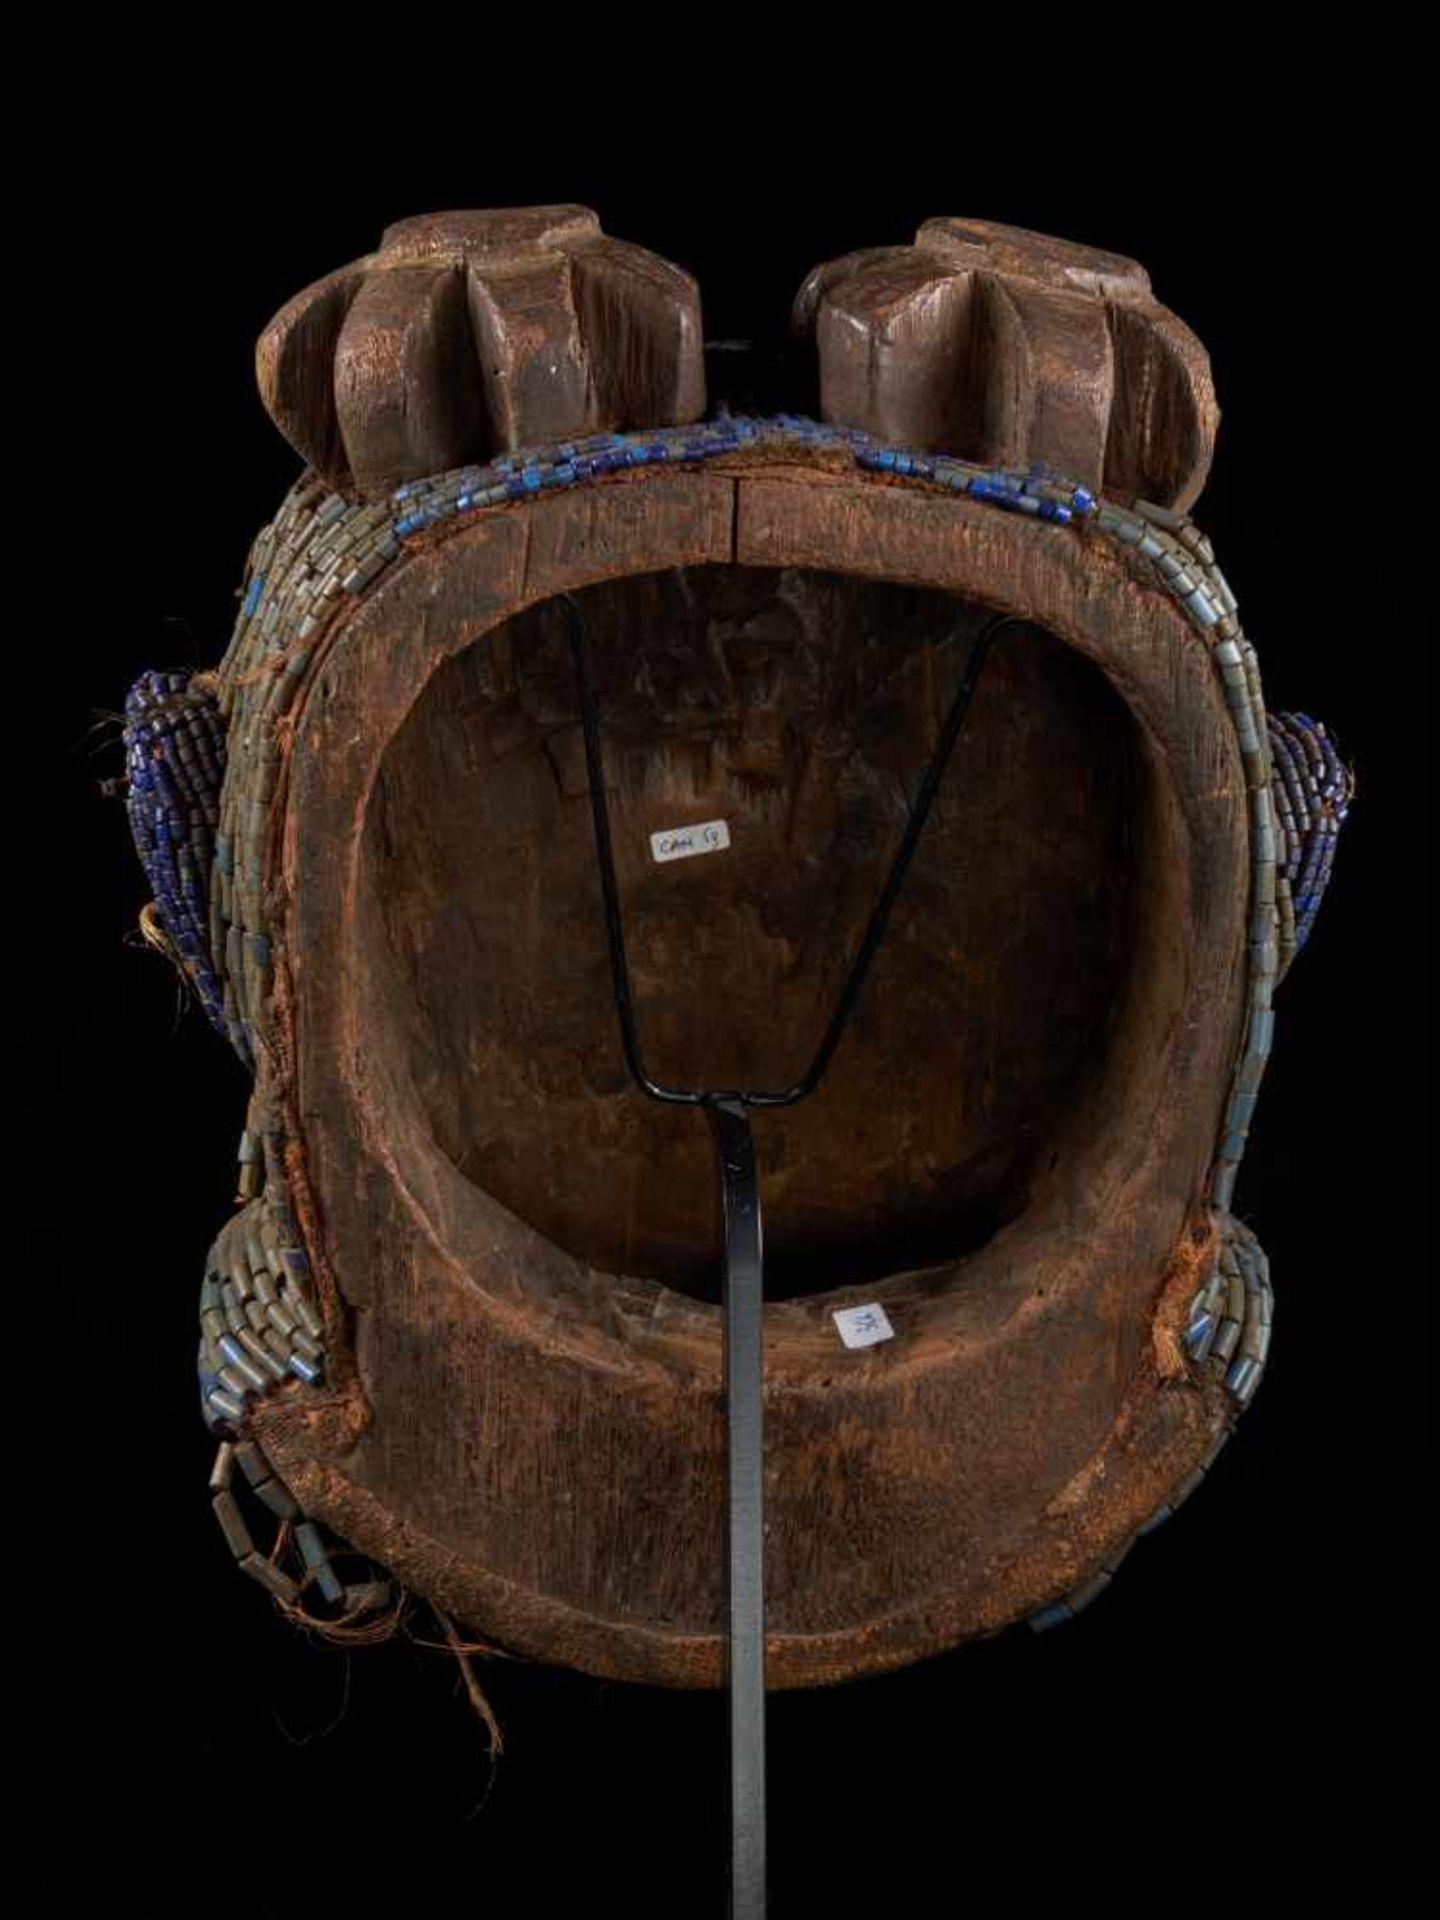 Beaded Gorilla Mask With Wooden Headdress - Tribal ArtA beautiful gorilla mask fashioned from wood - Bild 3 aus 7